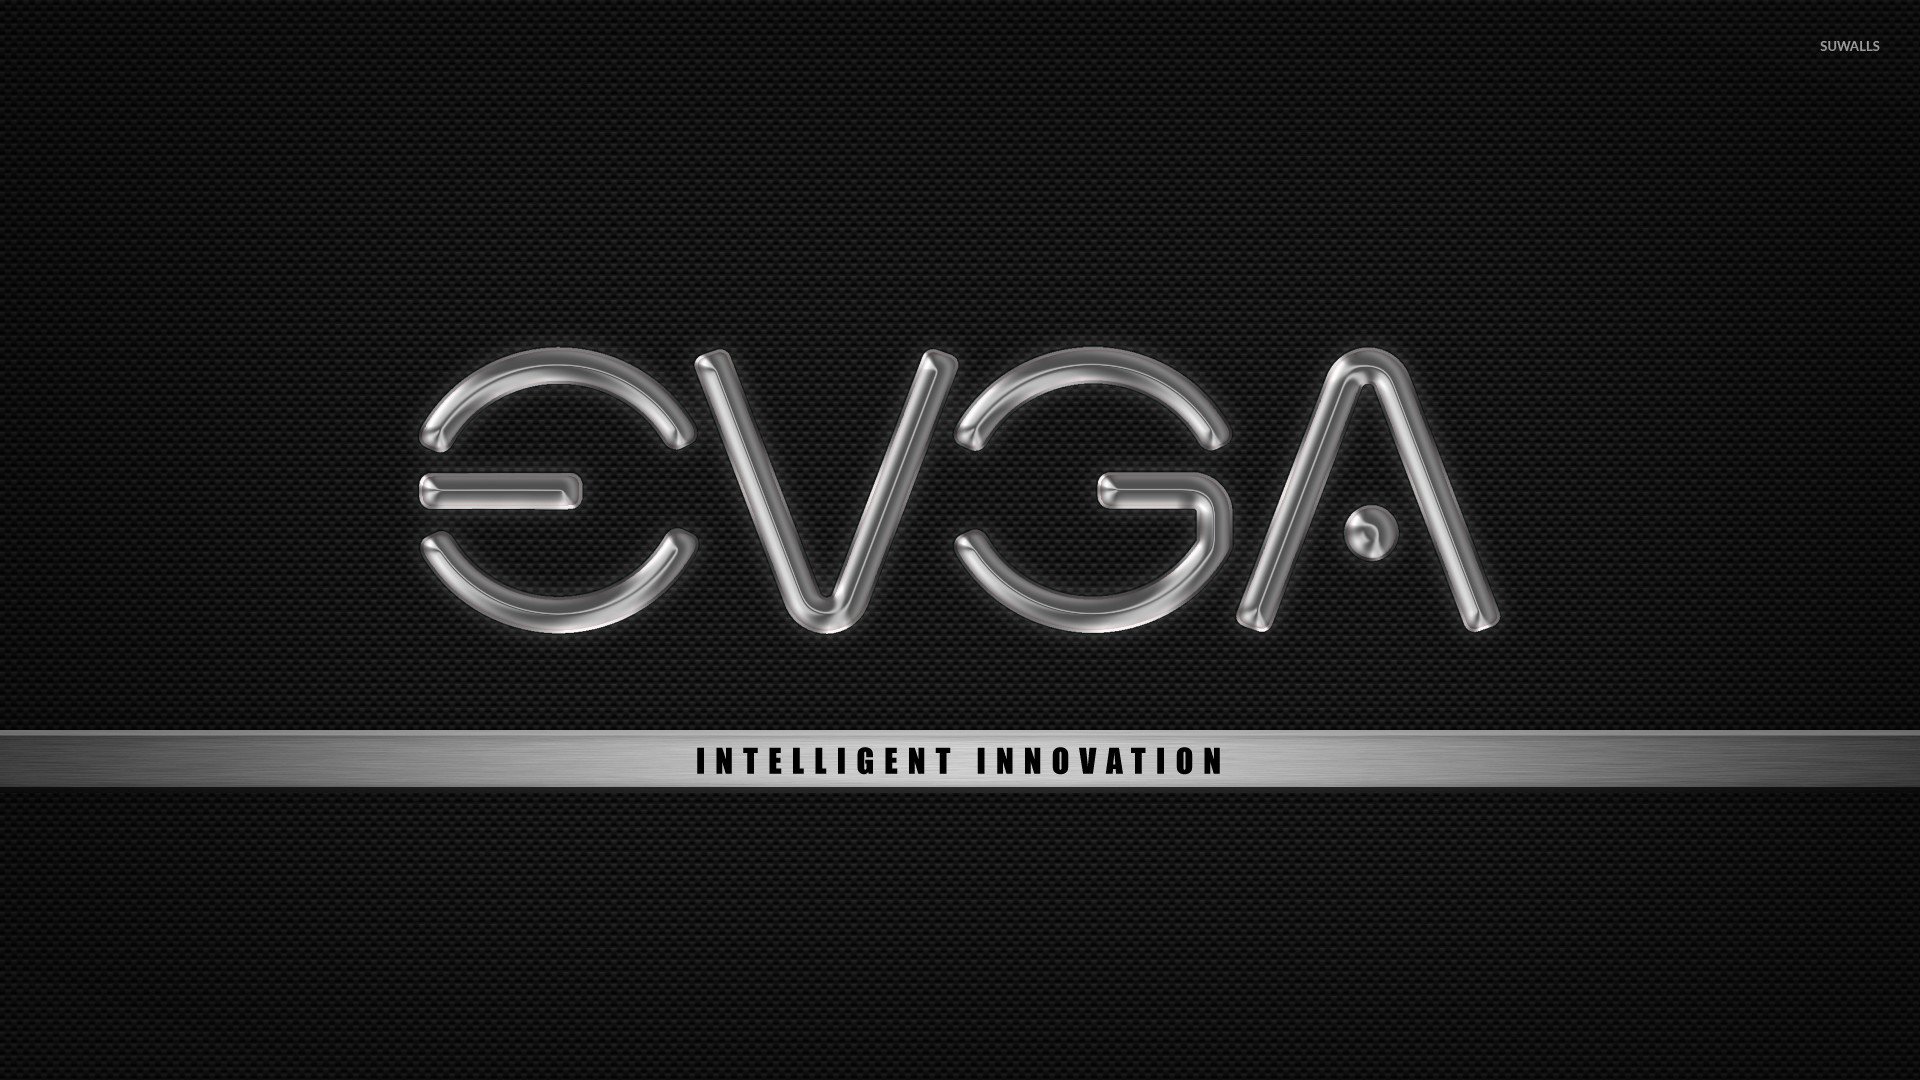 EVGA wallpaper – Computer wallpapers – #7789